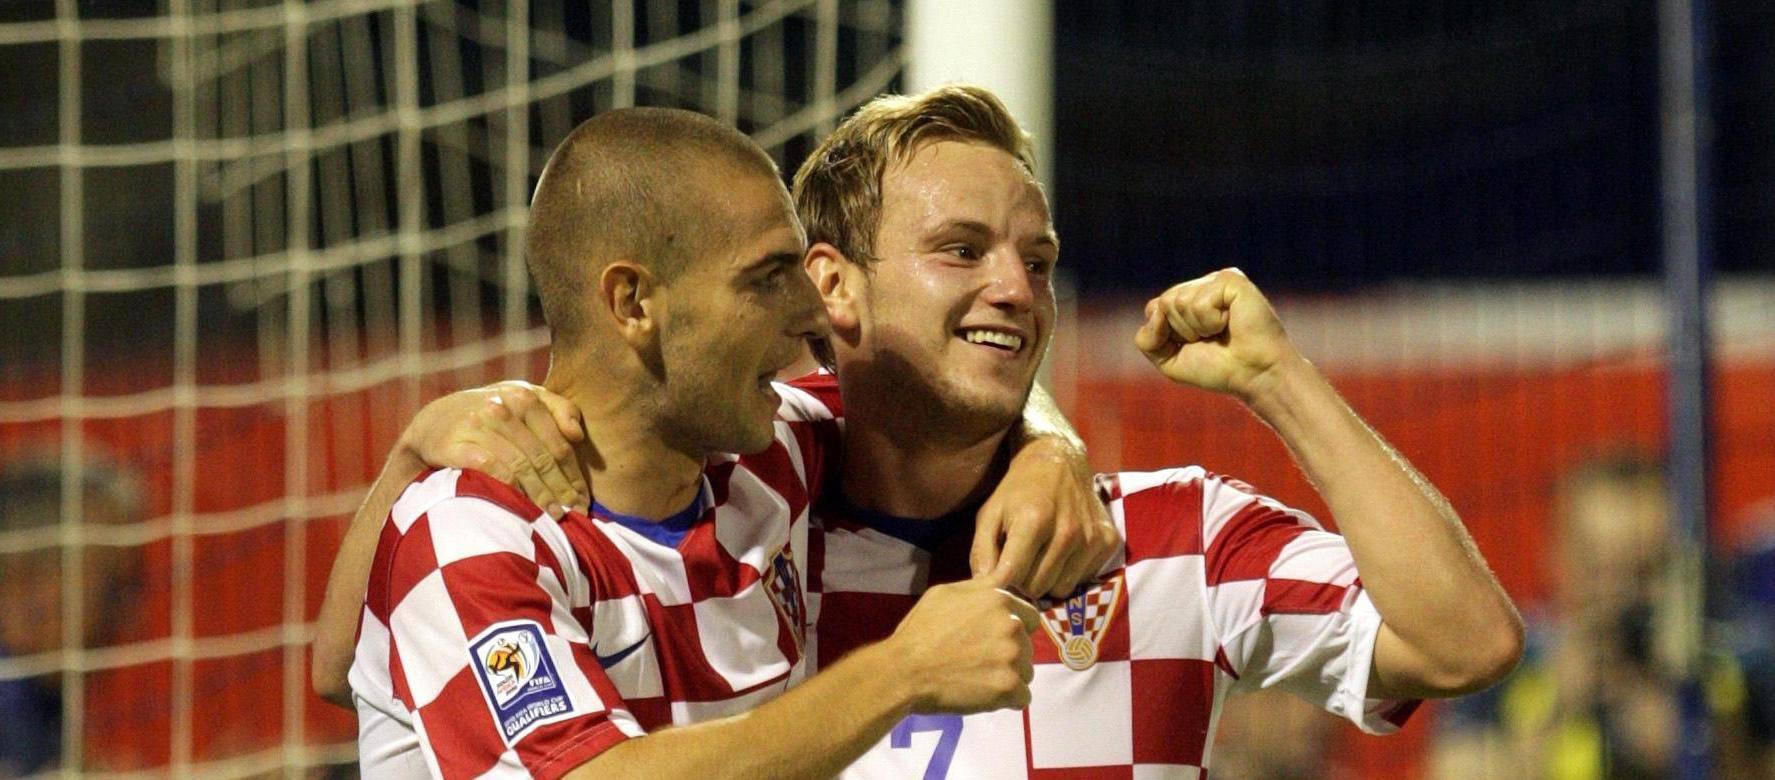 Hrvatska repka je 38 utakmica bez gola iz slobodnog udarca